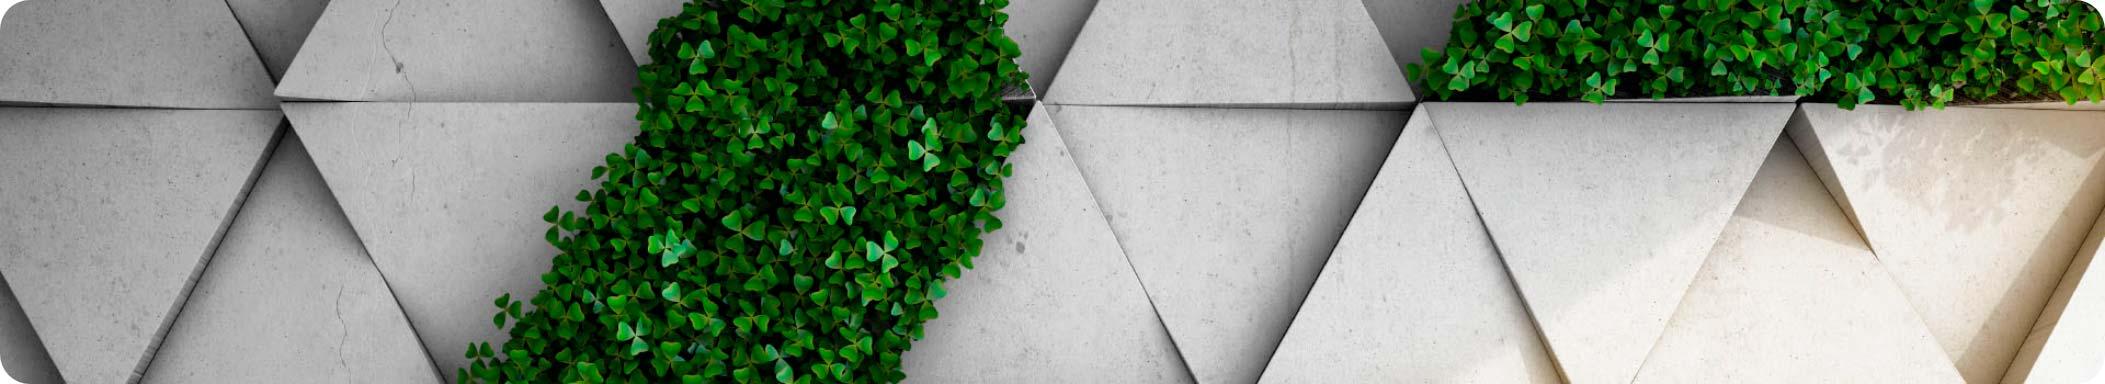 Low Carbon Footprint Concrete Sustainability